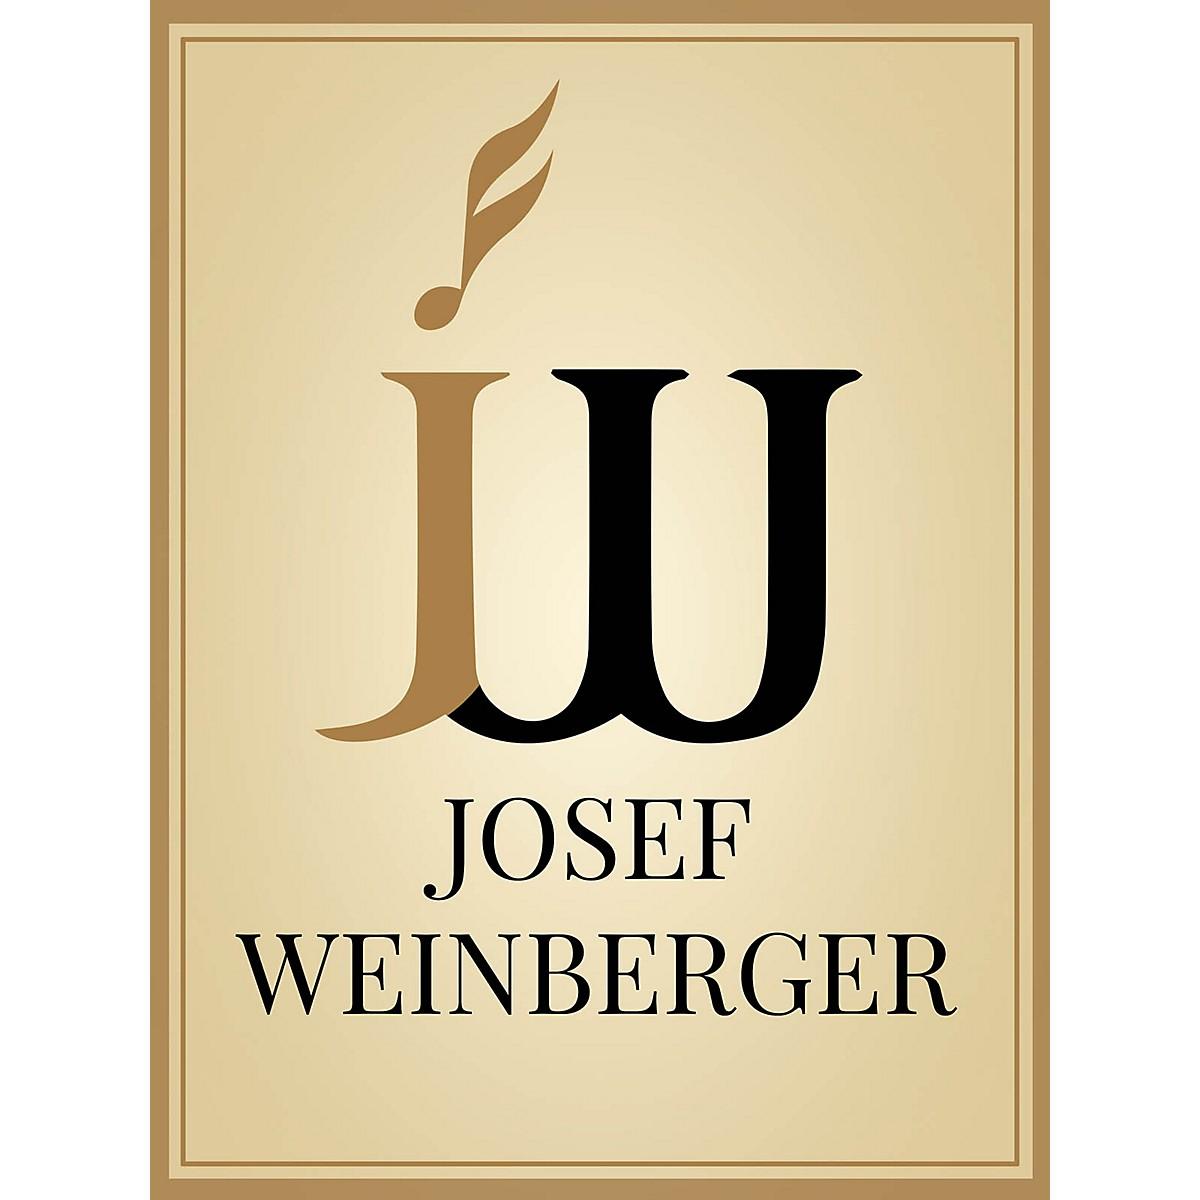 Joseph Weinberger Italian Intermezzo Boosey & Hawkes Chamber Music Series Composed by Ermanno Wolf-Ferrari